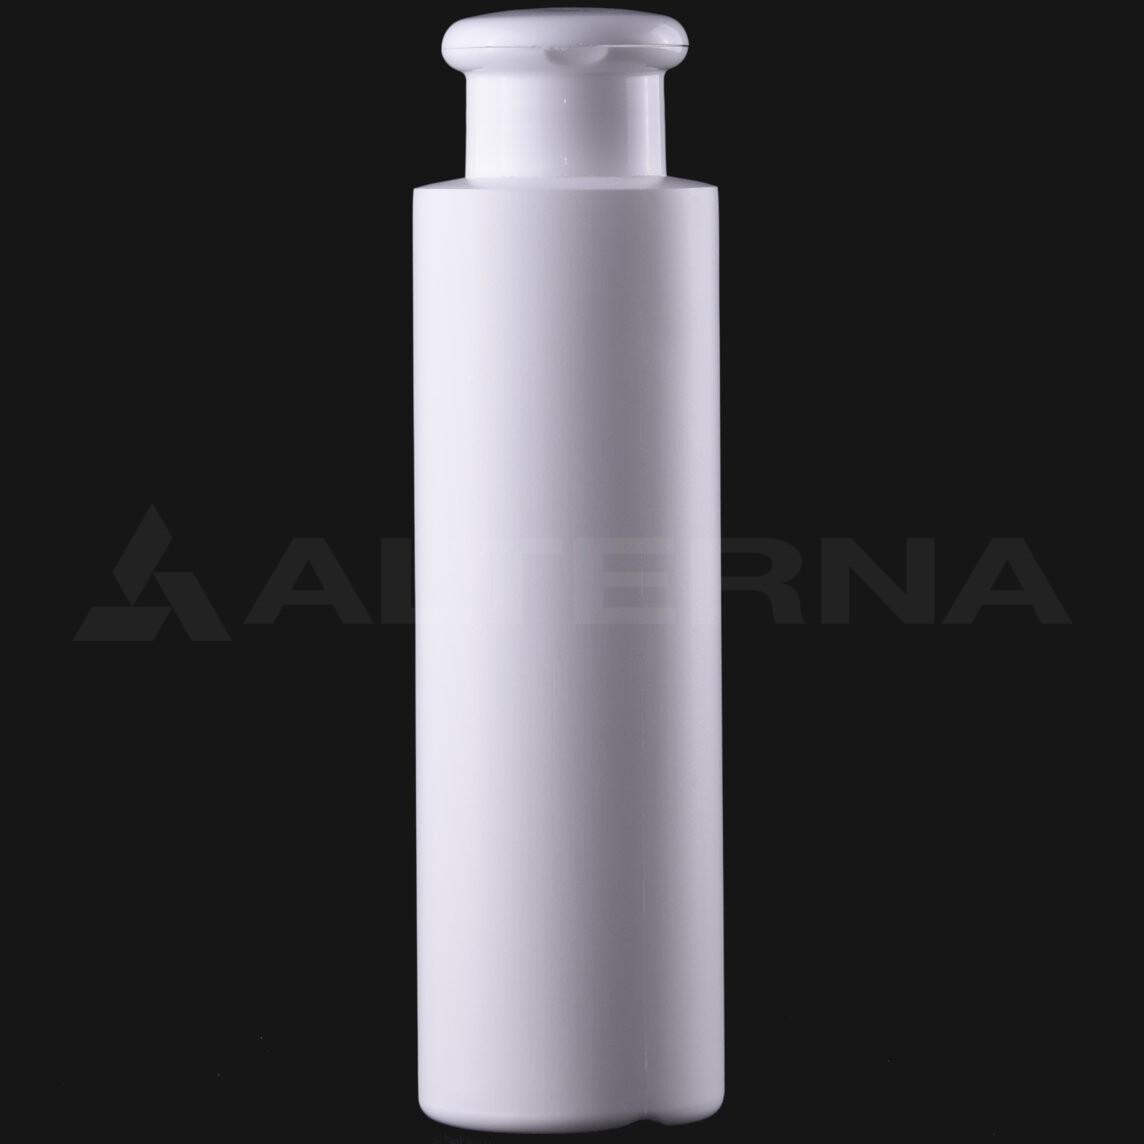 250 ml HDPE Bottle with 28 mm Flip Top Cap